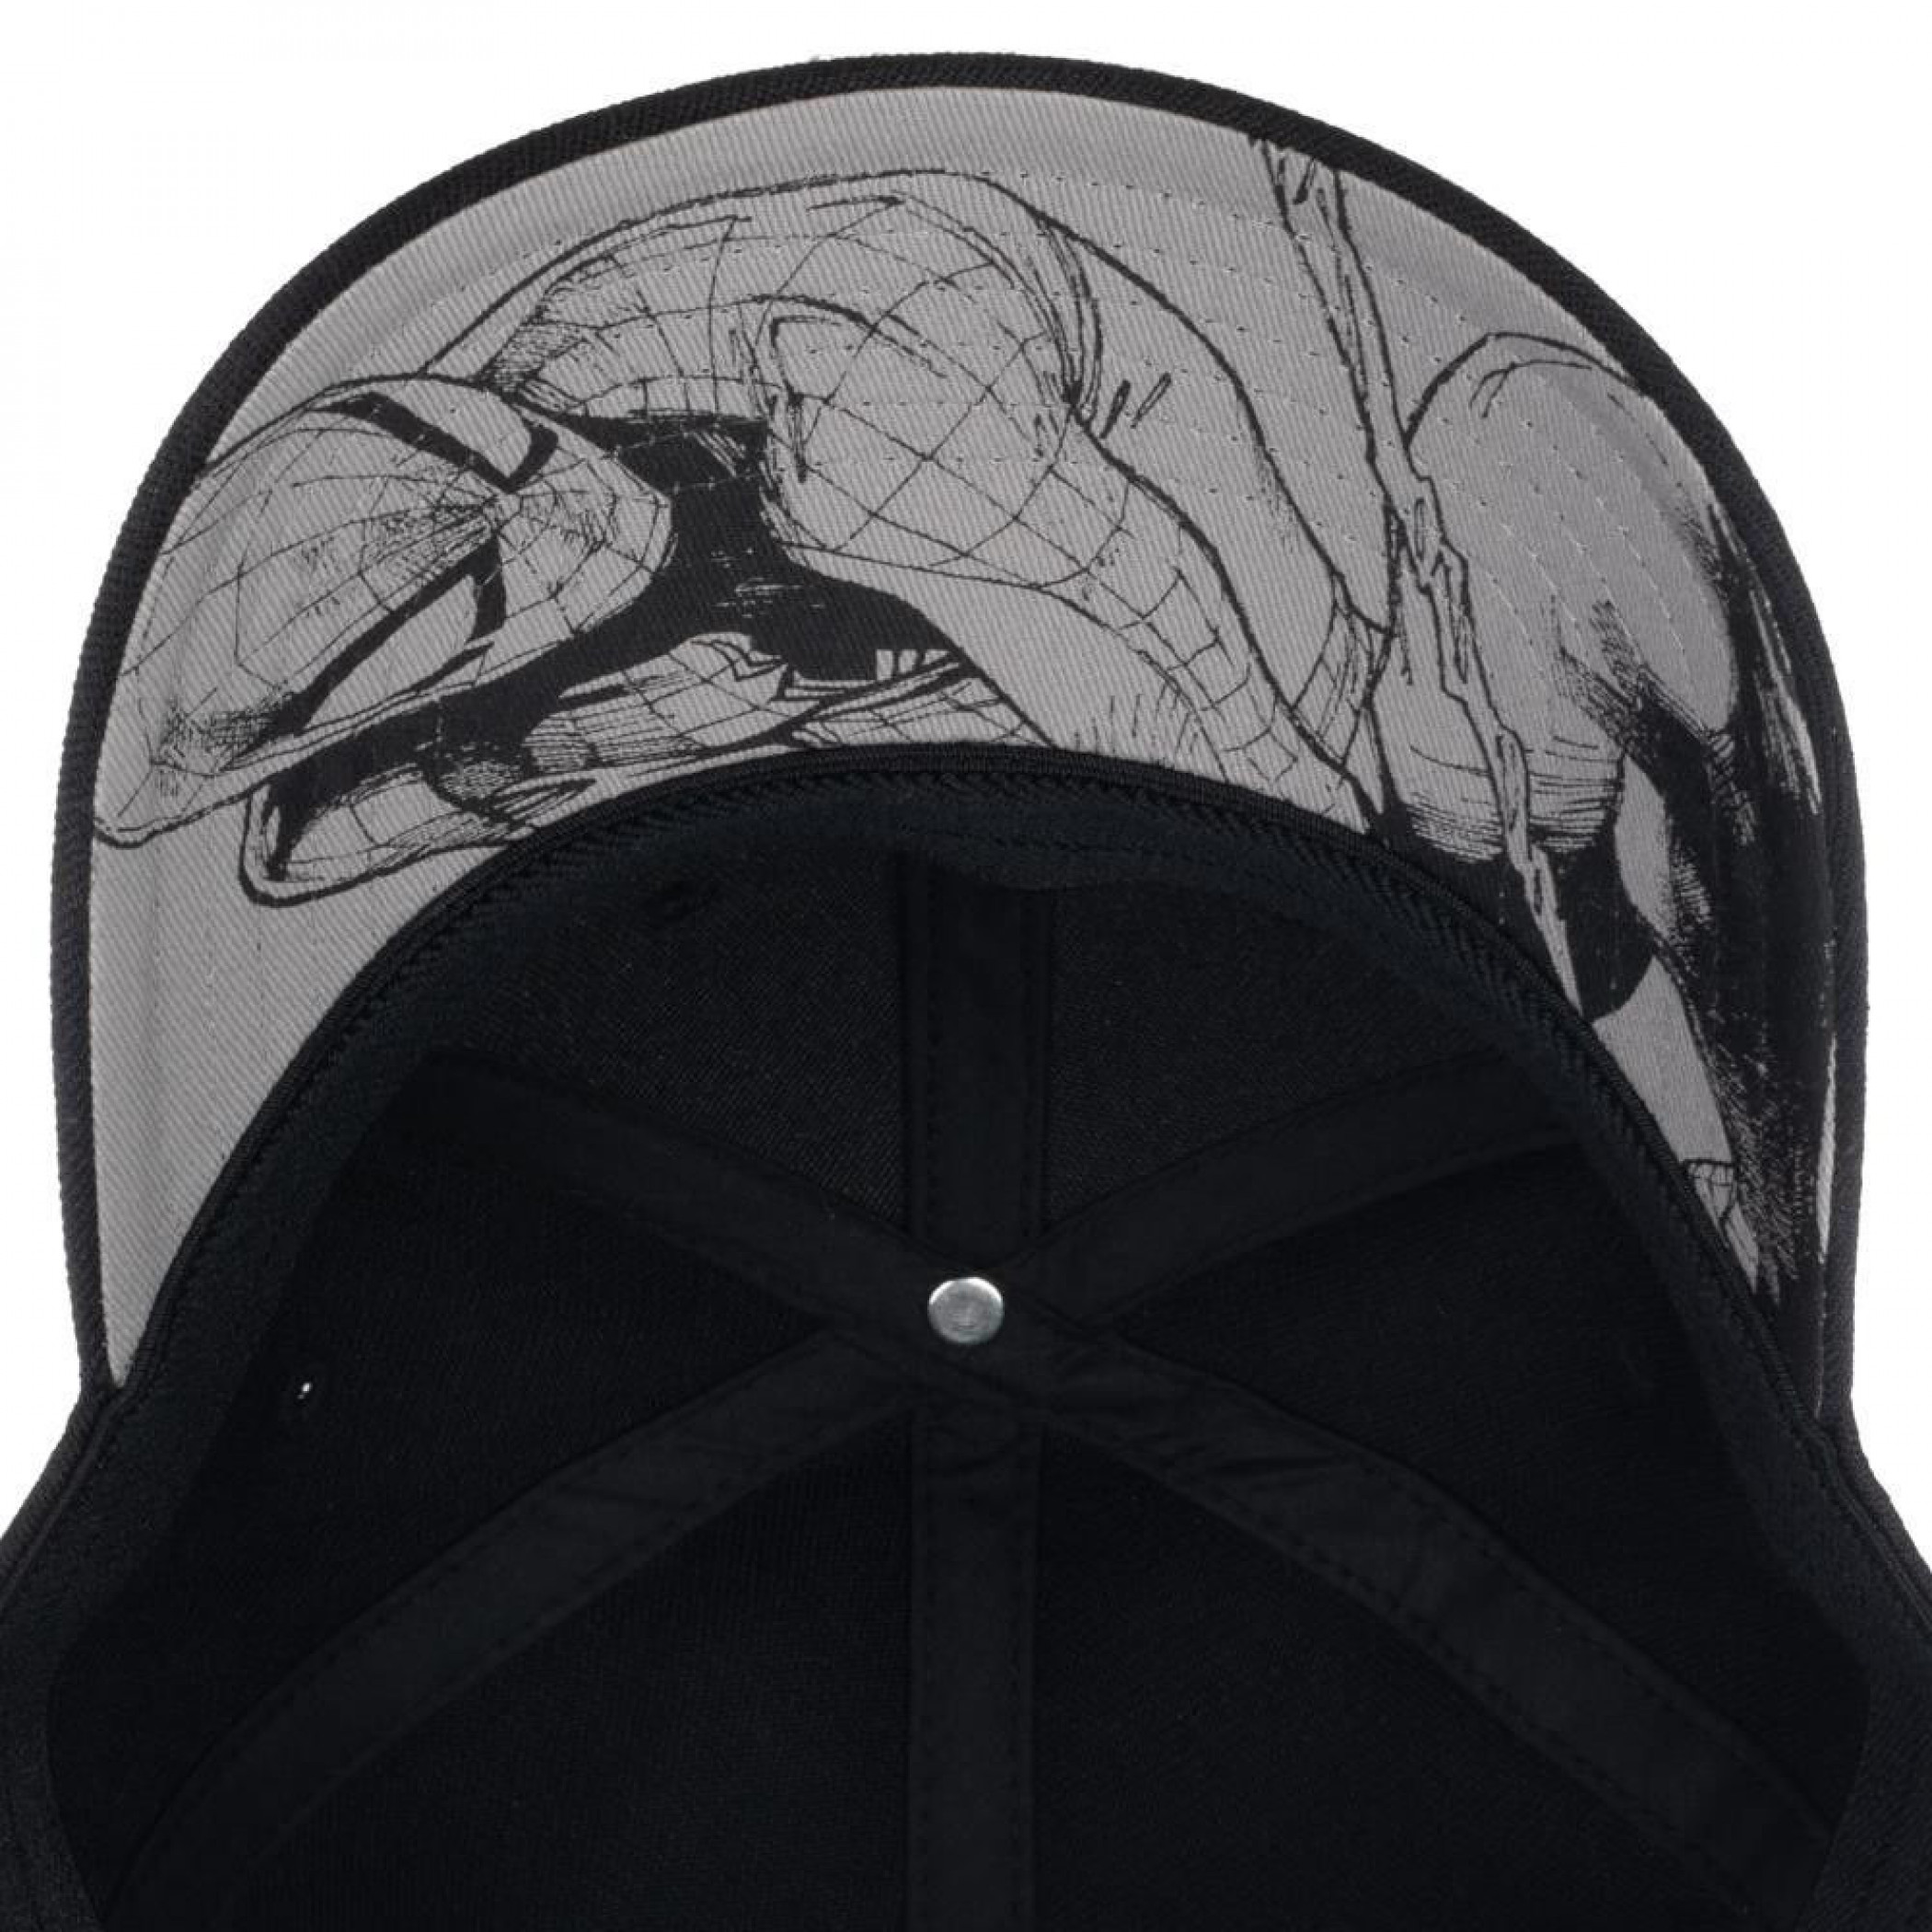 Spider-Man Embroidered Symbol Flex Fit Hat